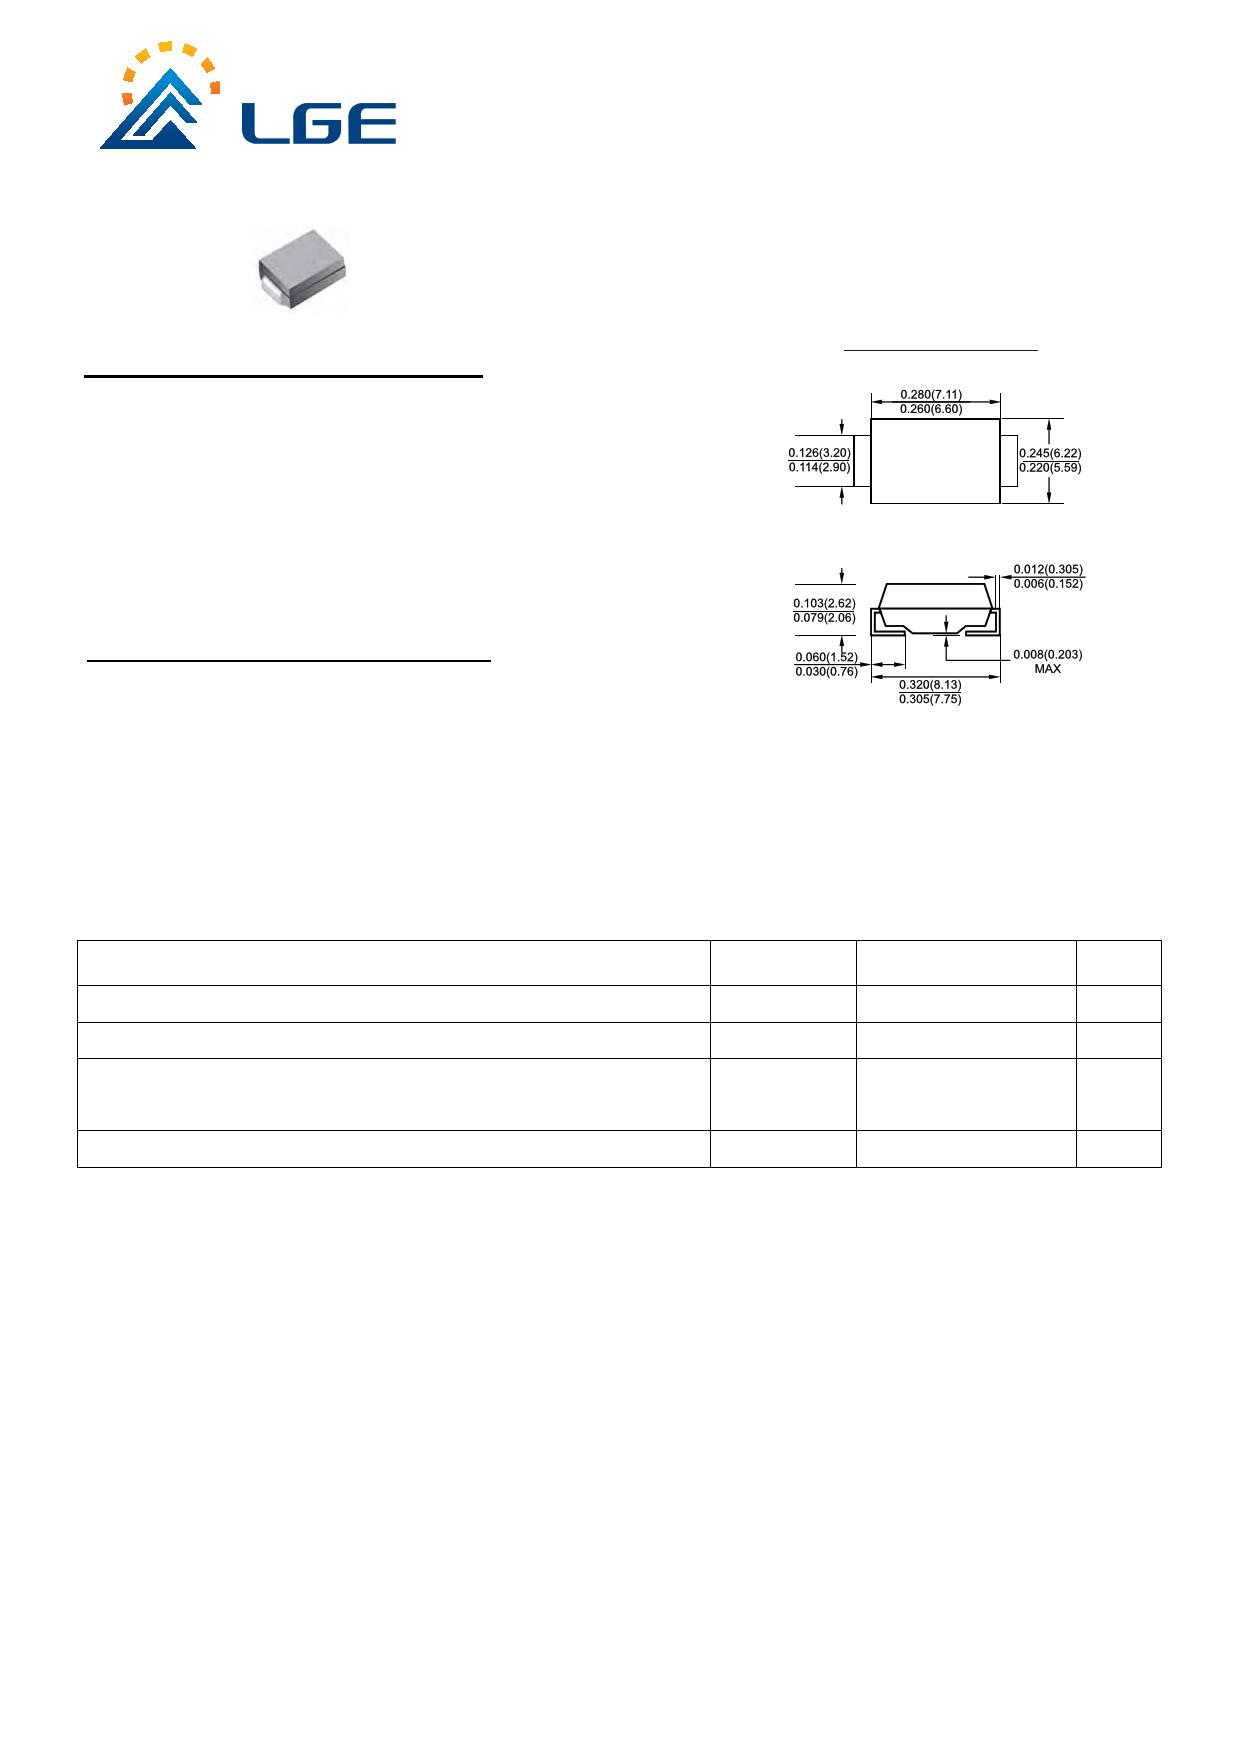 3.0SMCJ160CA Datasheet, 3.0SMCJ160CA PDF,ピン配置, 機能